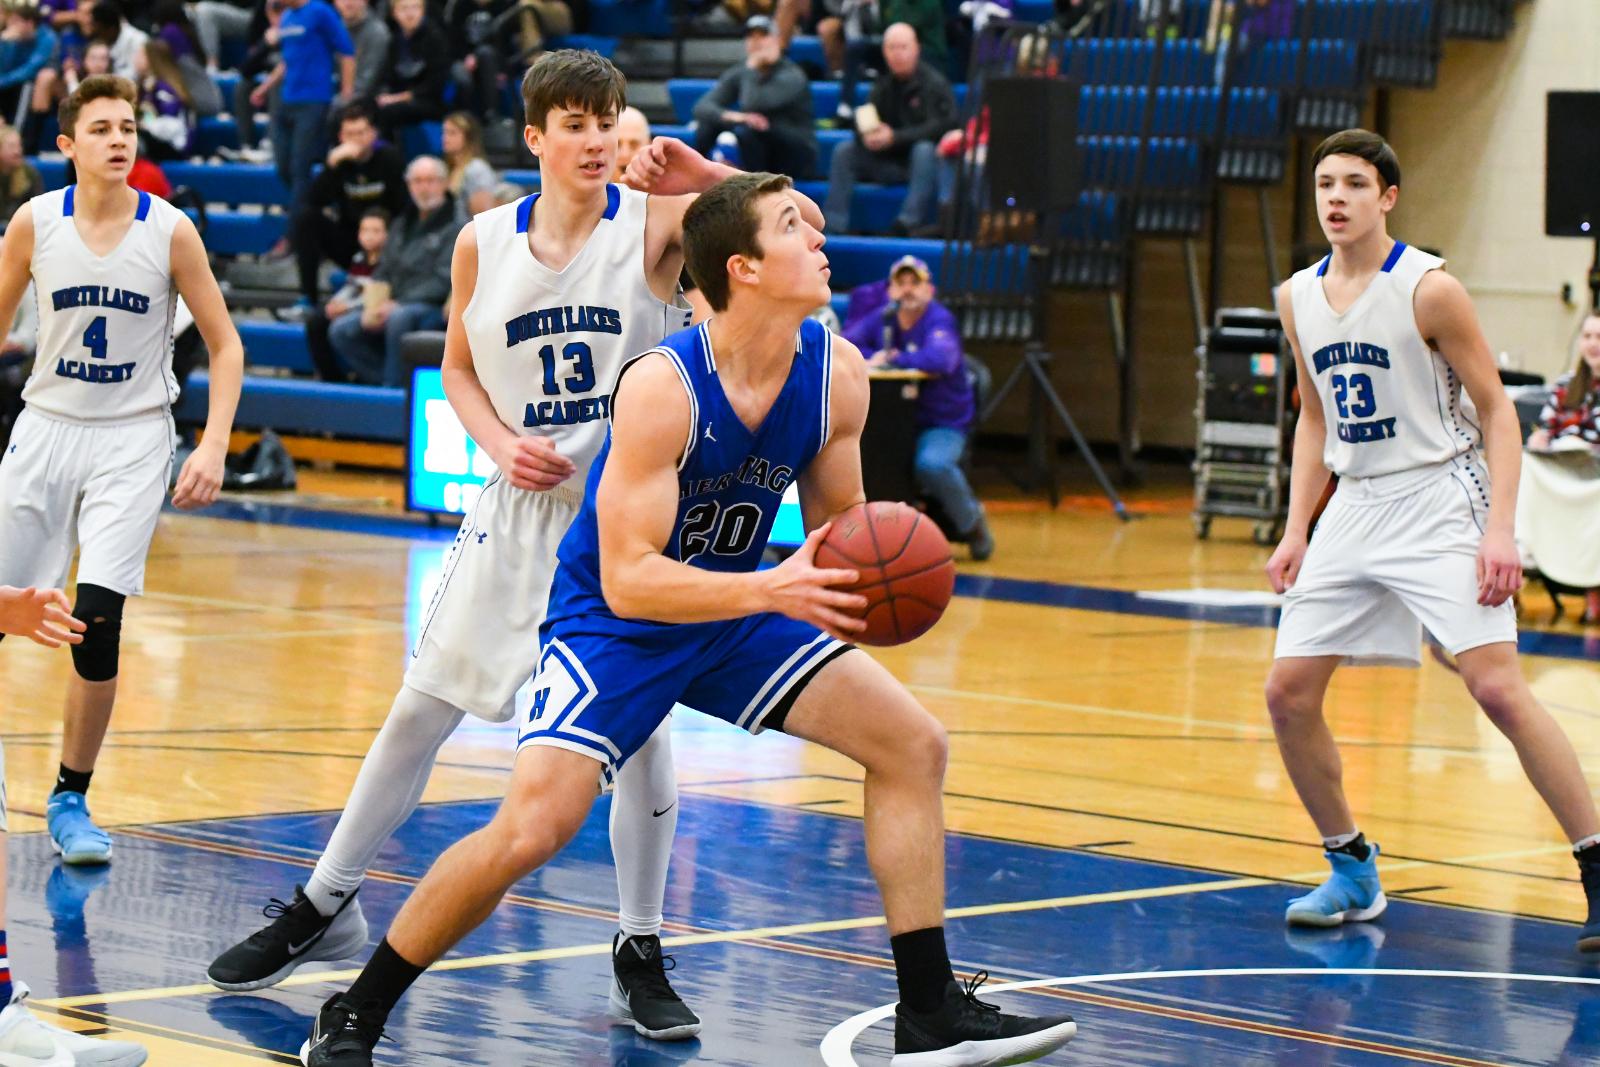 HCA Boys Basketball notches a win over North Lakes Academy!